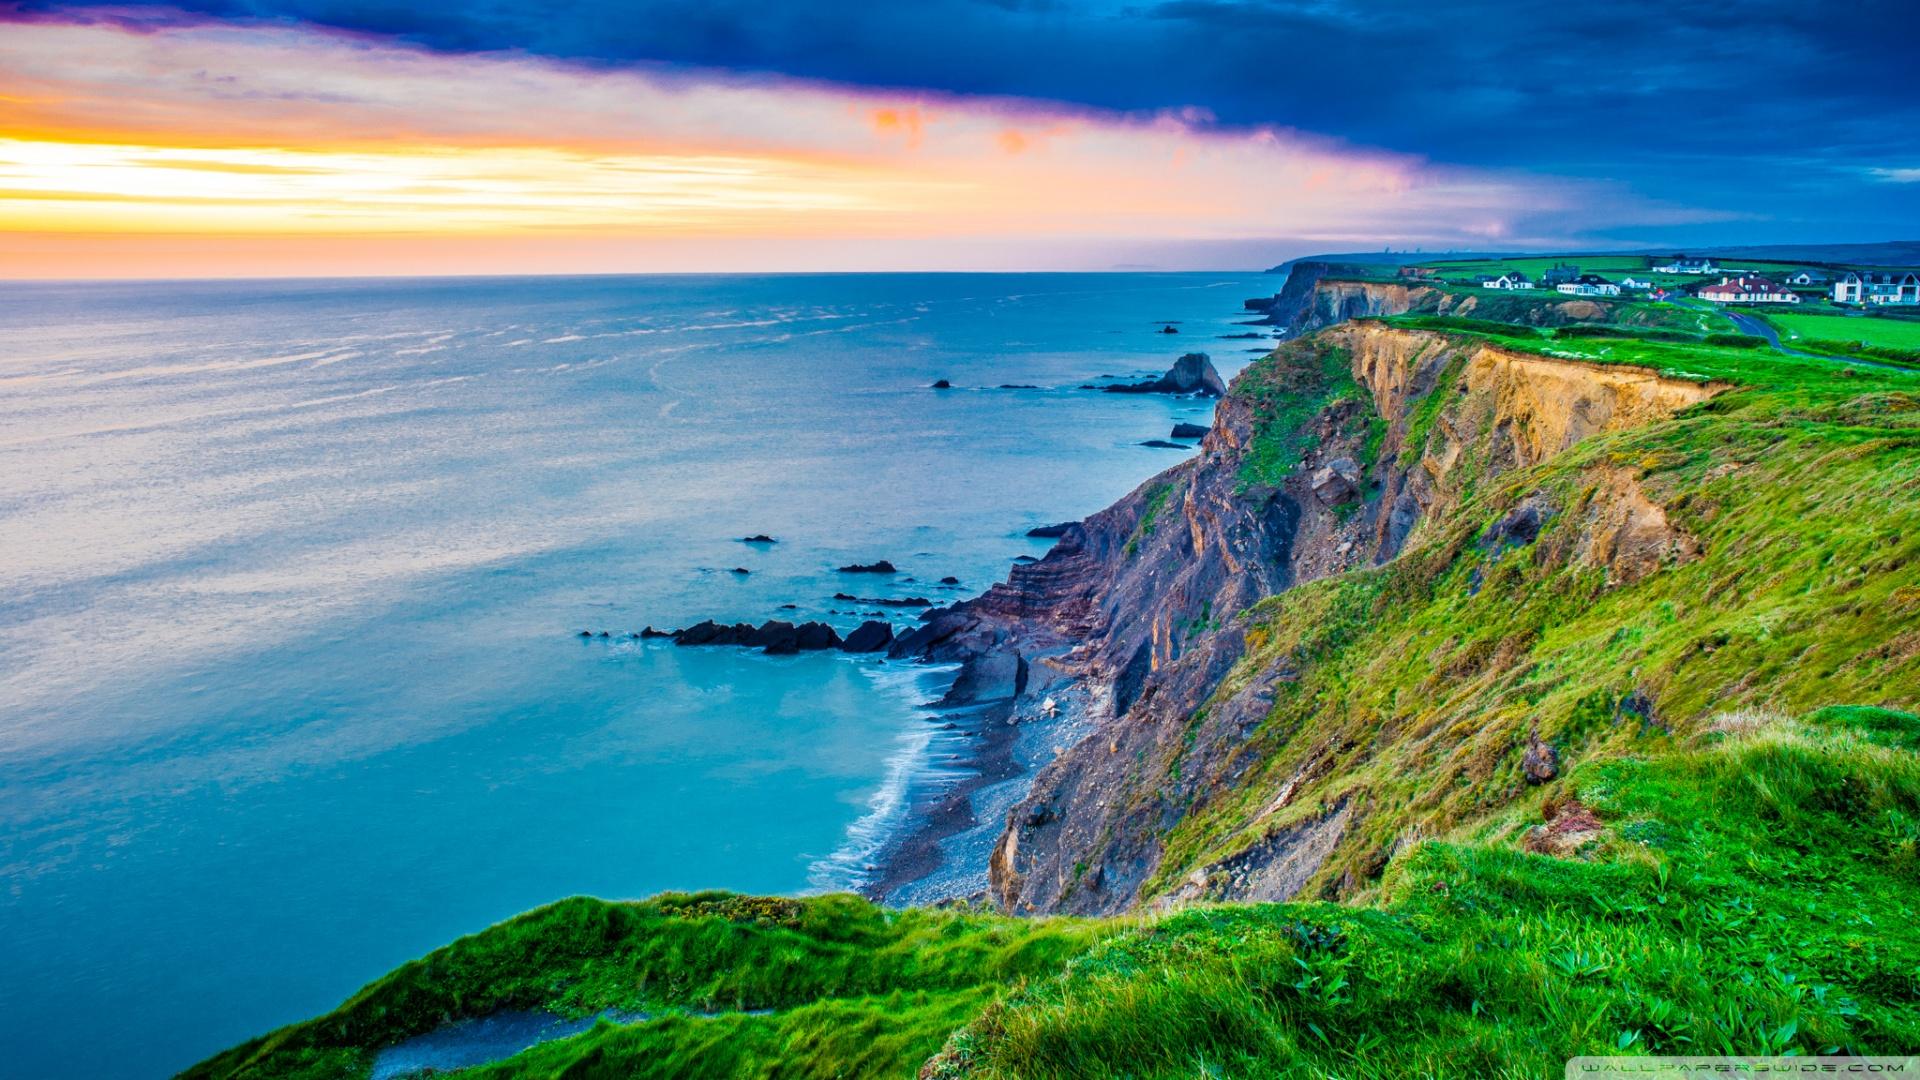 Coast Cornwall England United Kingdom 4K HD Desktop 1920x1080